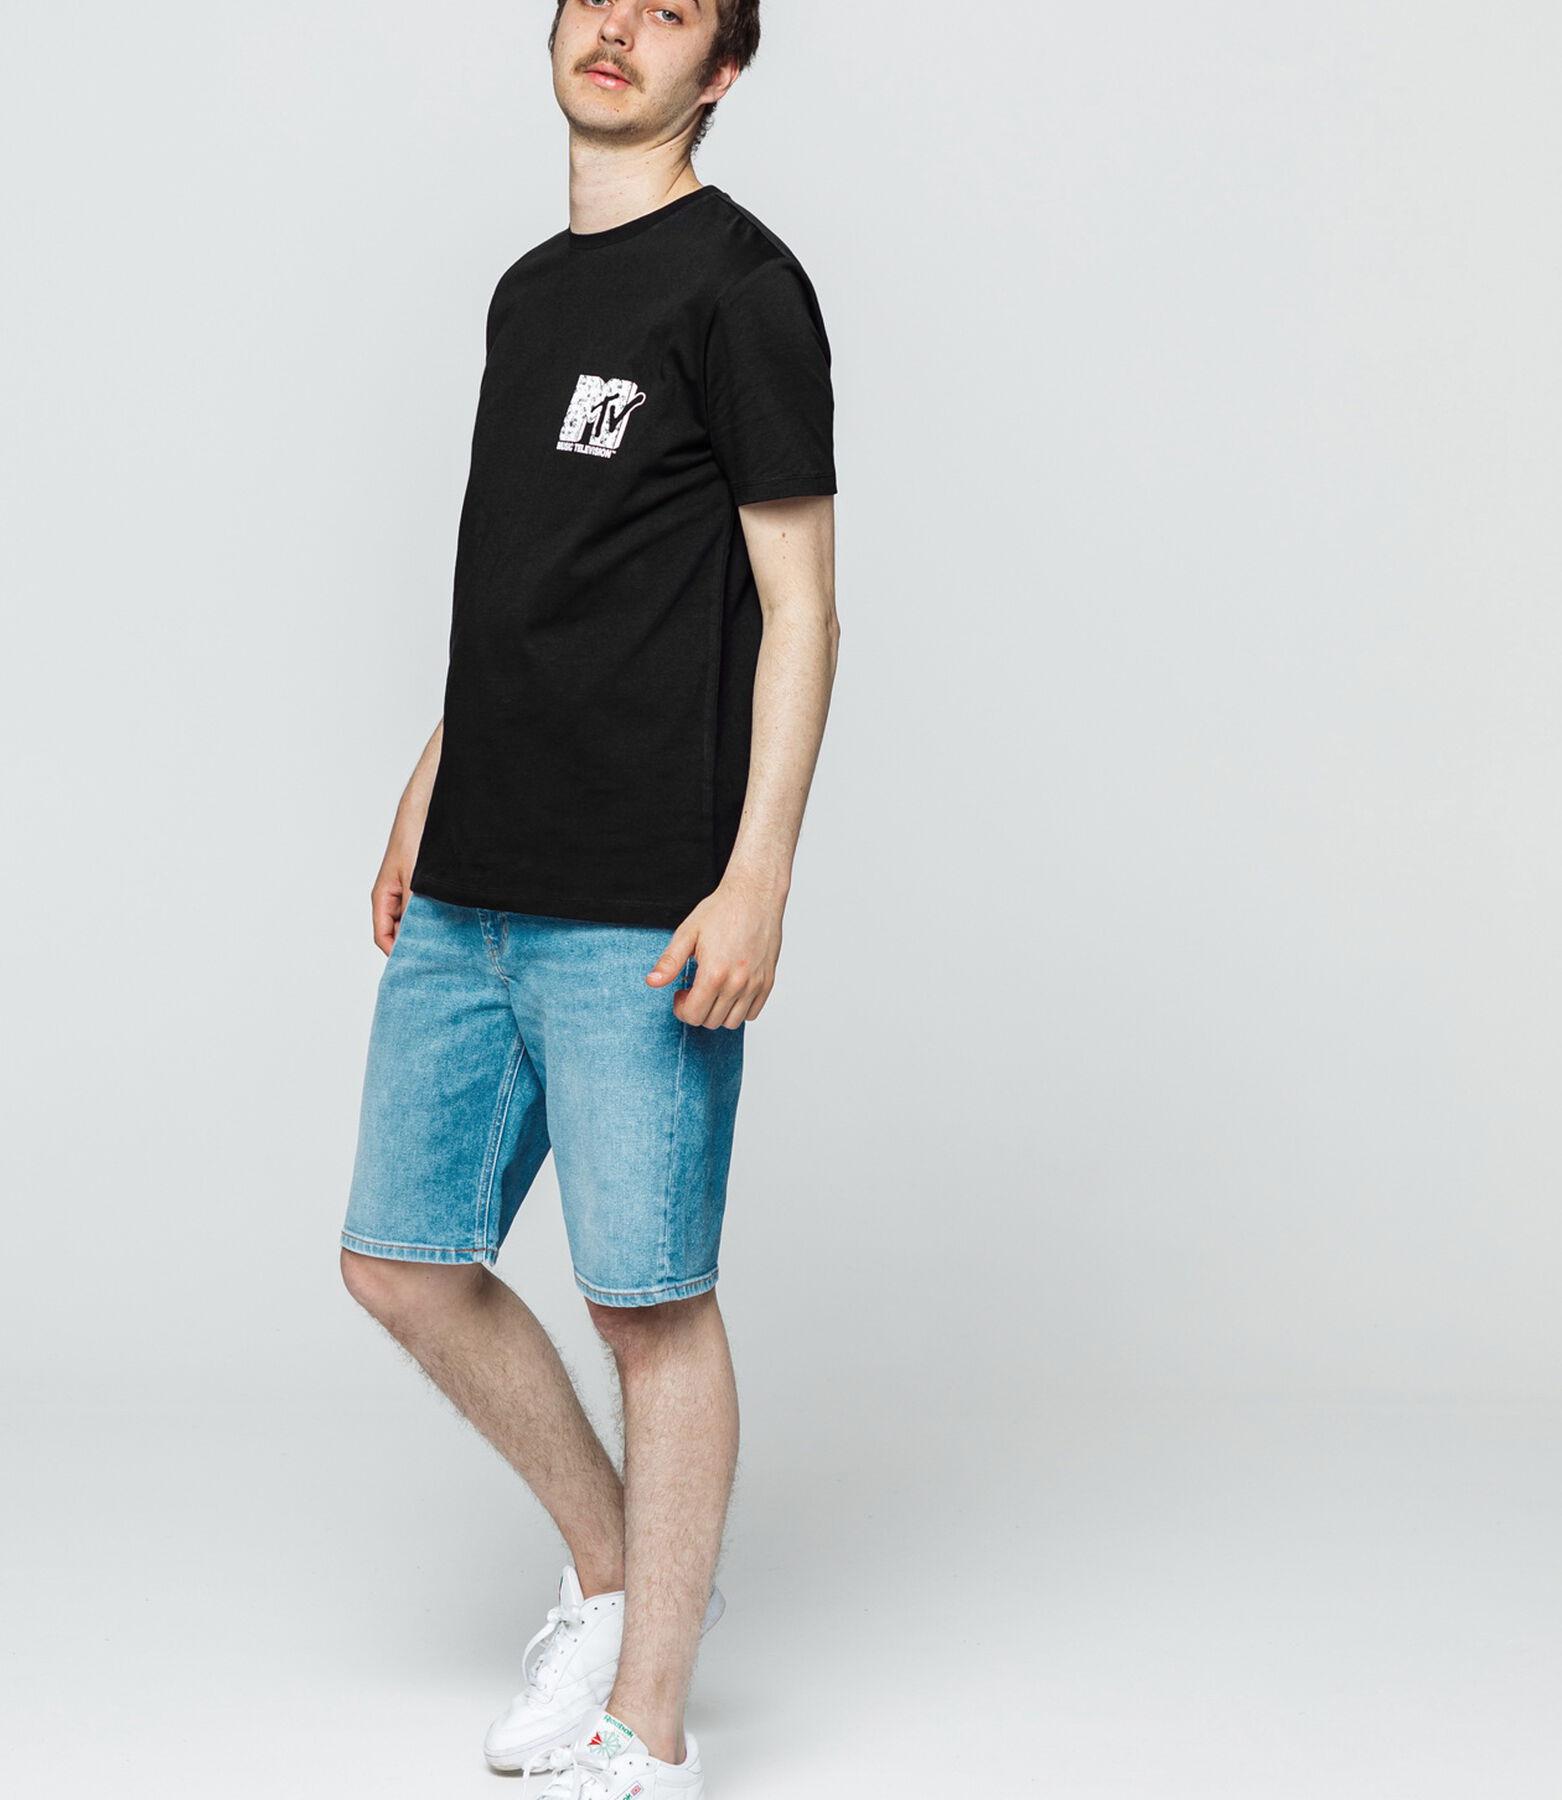 T-shirt avec print MTV devant dos